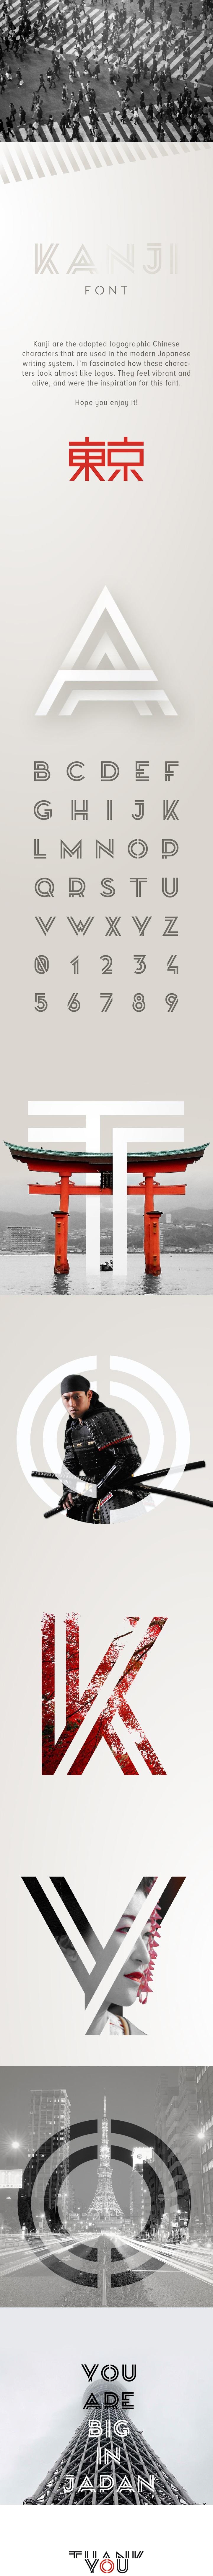 Kanji Font - Befonts com